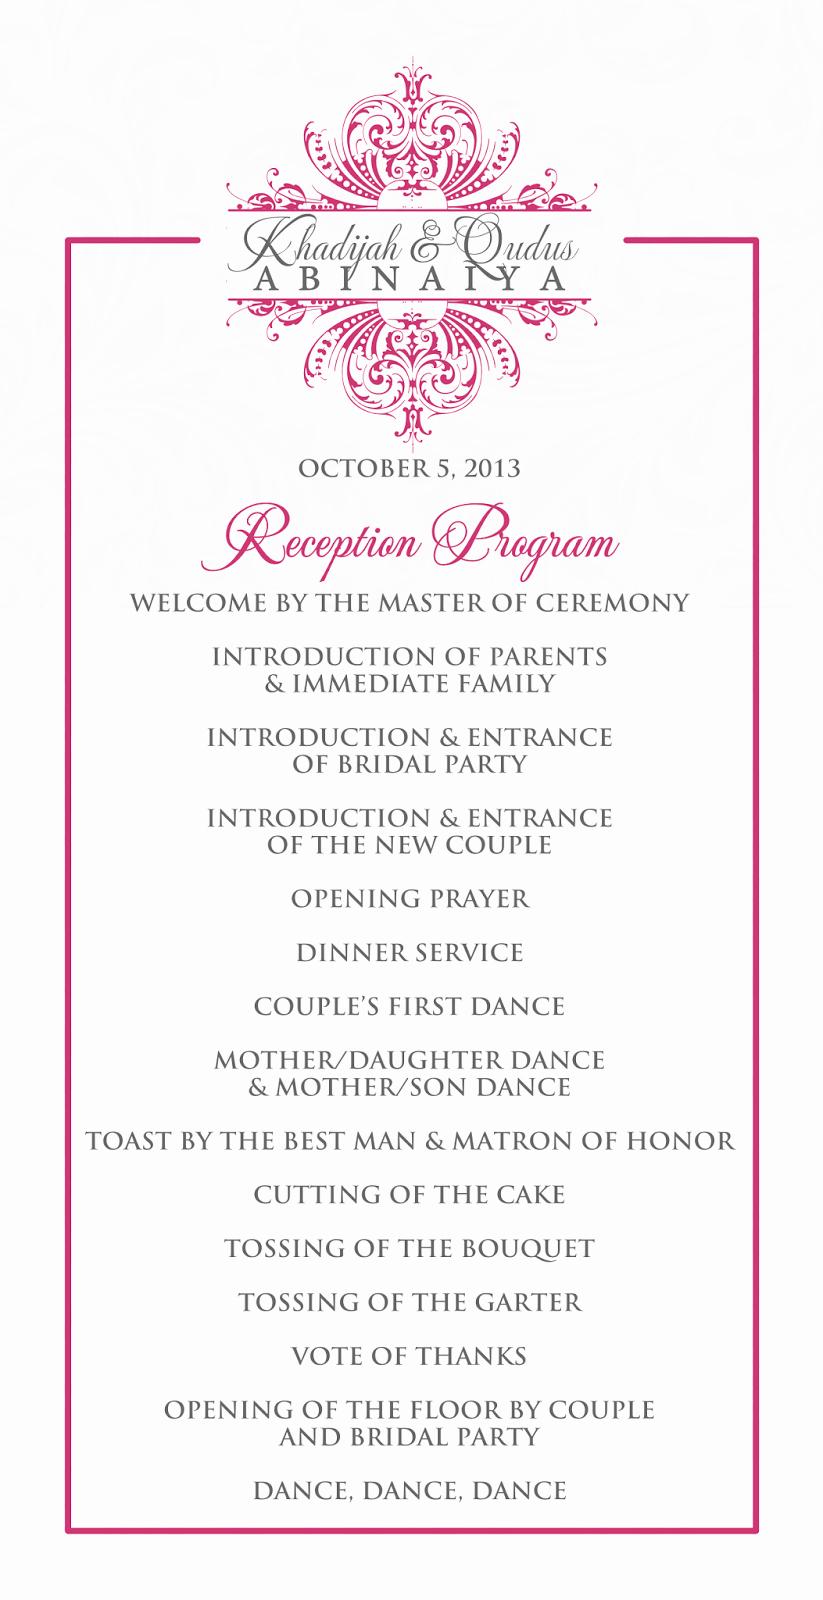 Wedding Reception Program Example Unique Signatures by Sarah Wedding Stationery for Khadijah